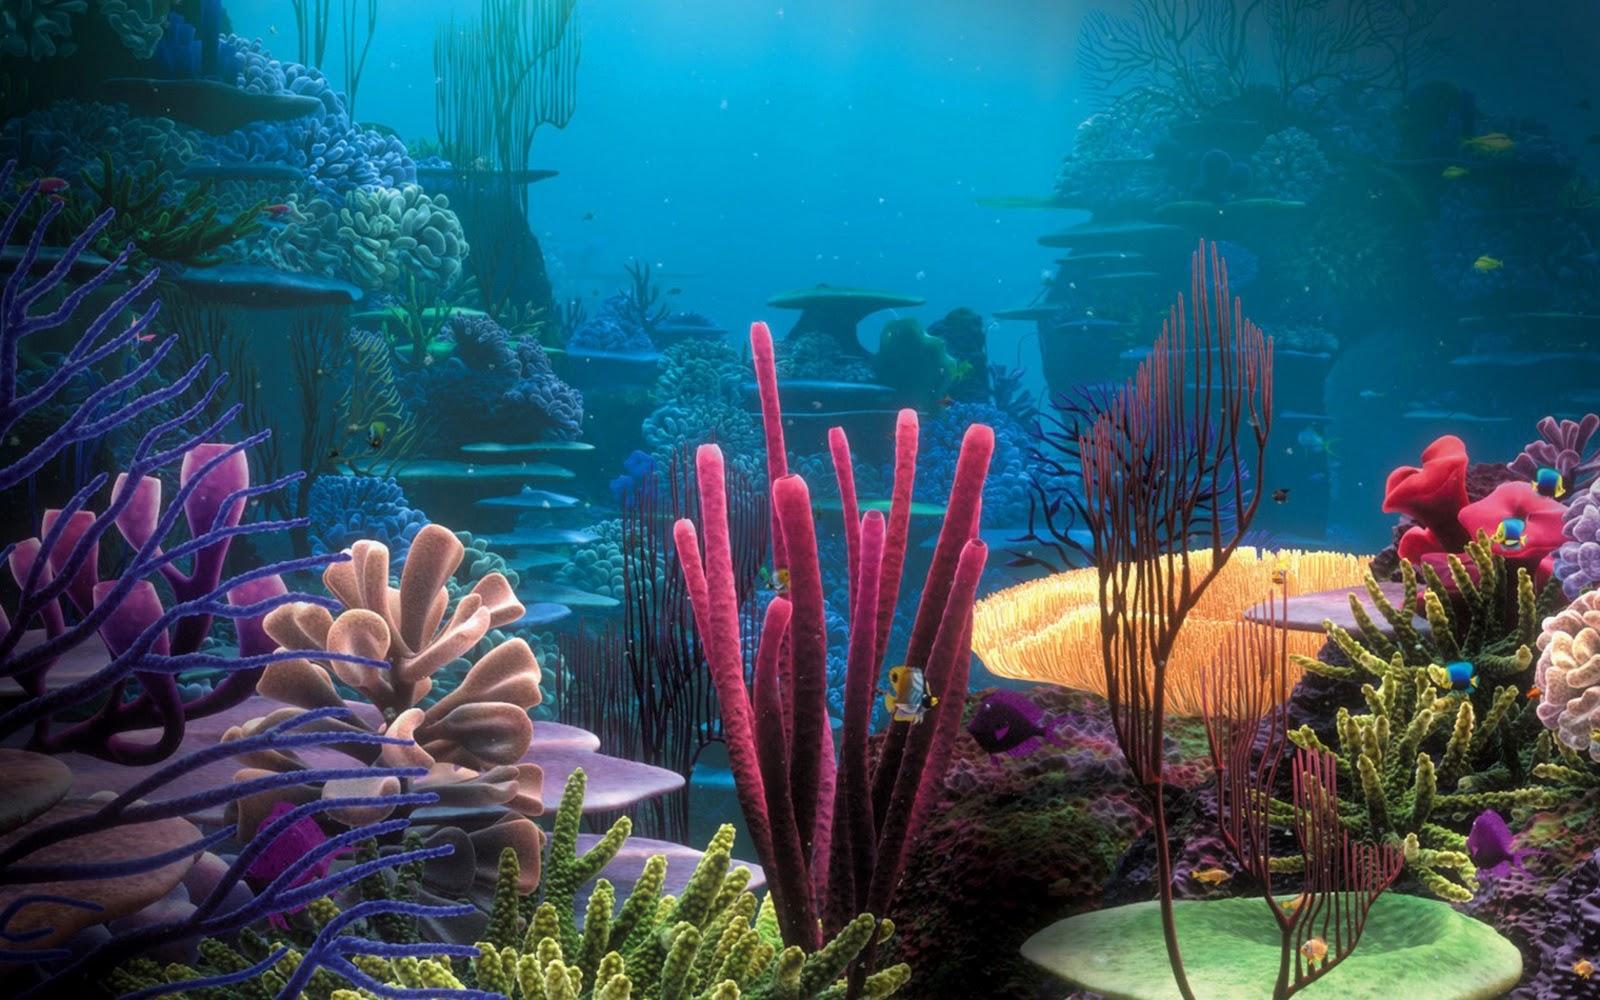 aQUATIC & mARINE OCEAN BIOME   Sutori